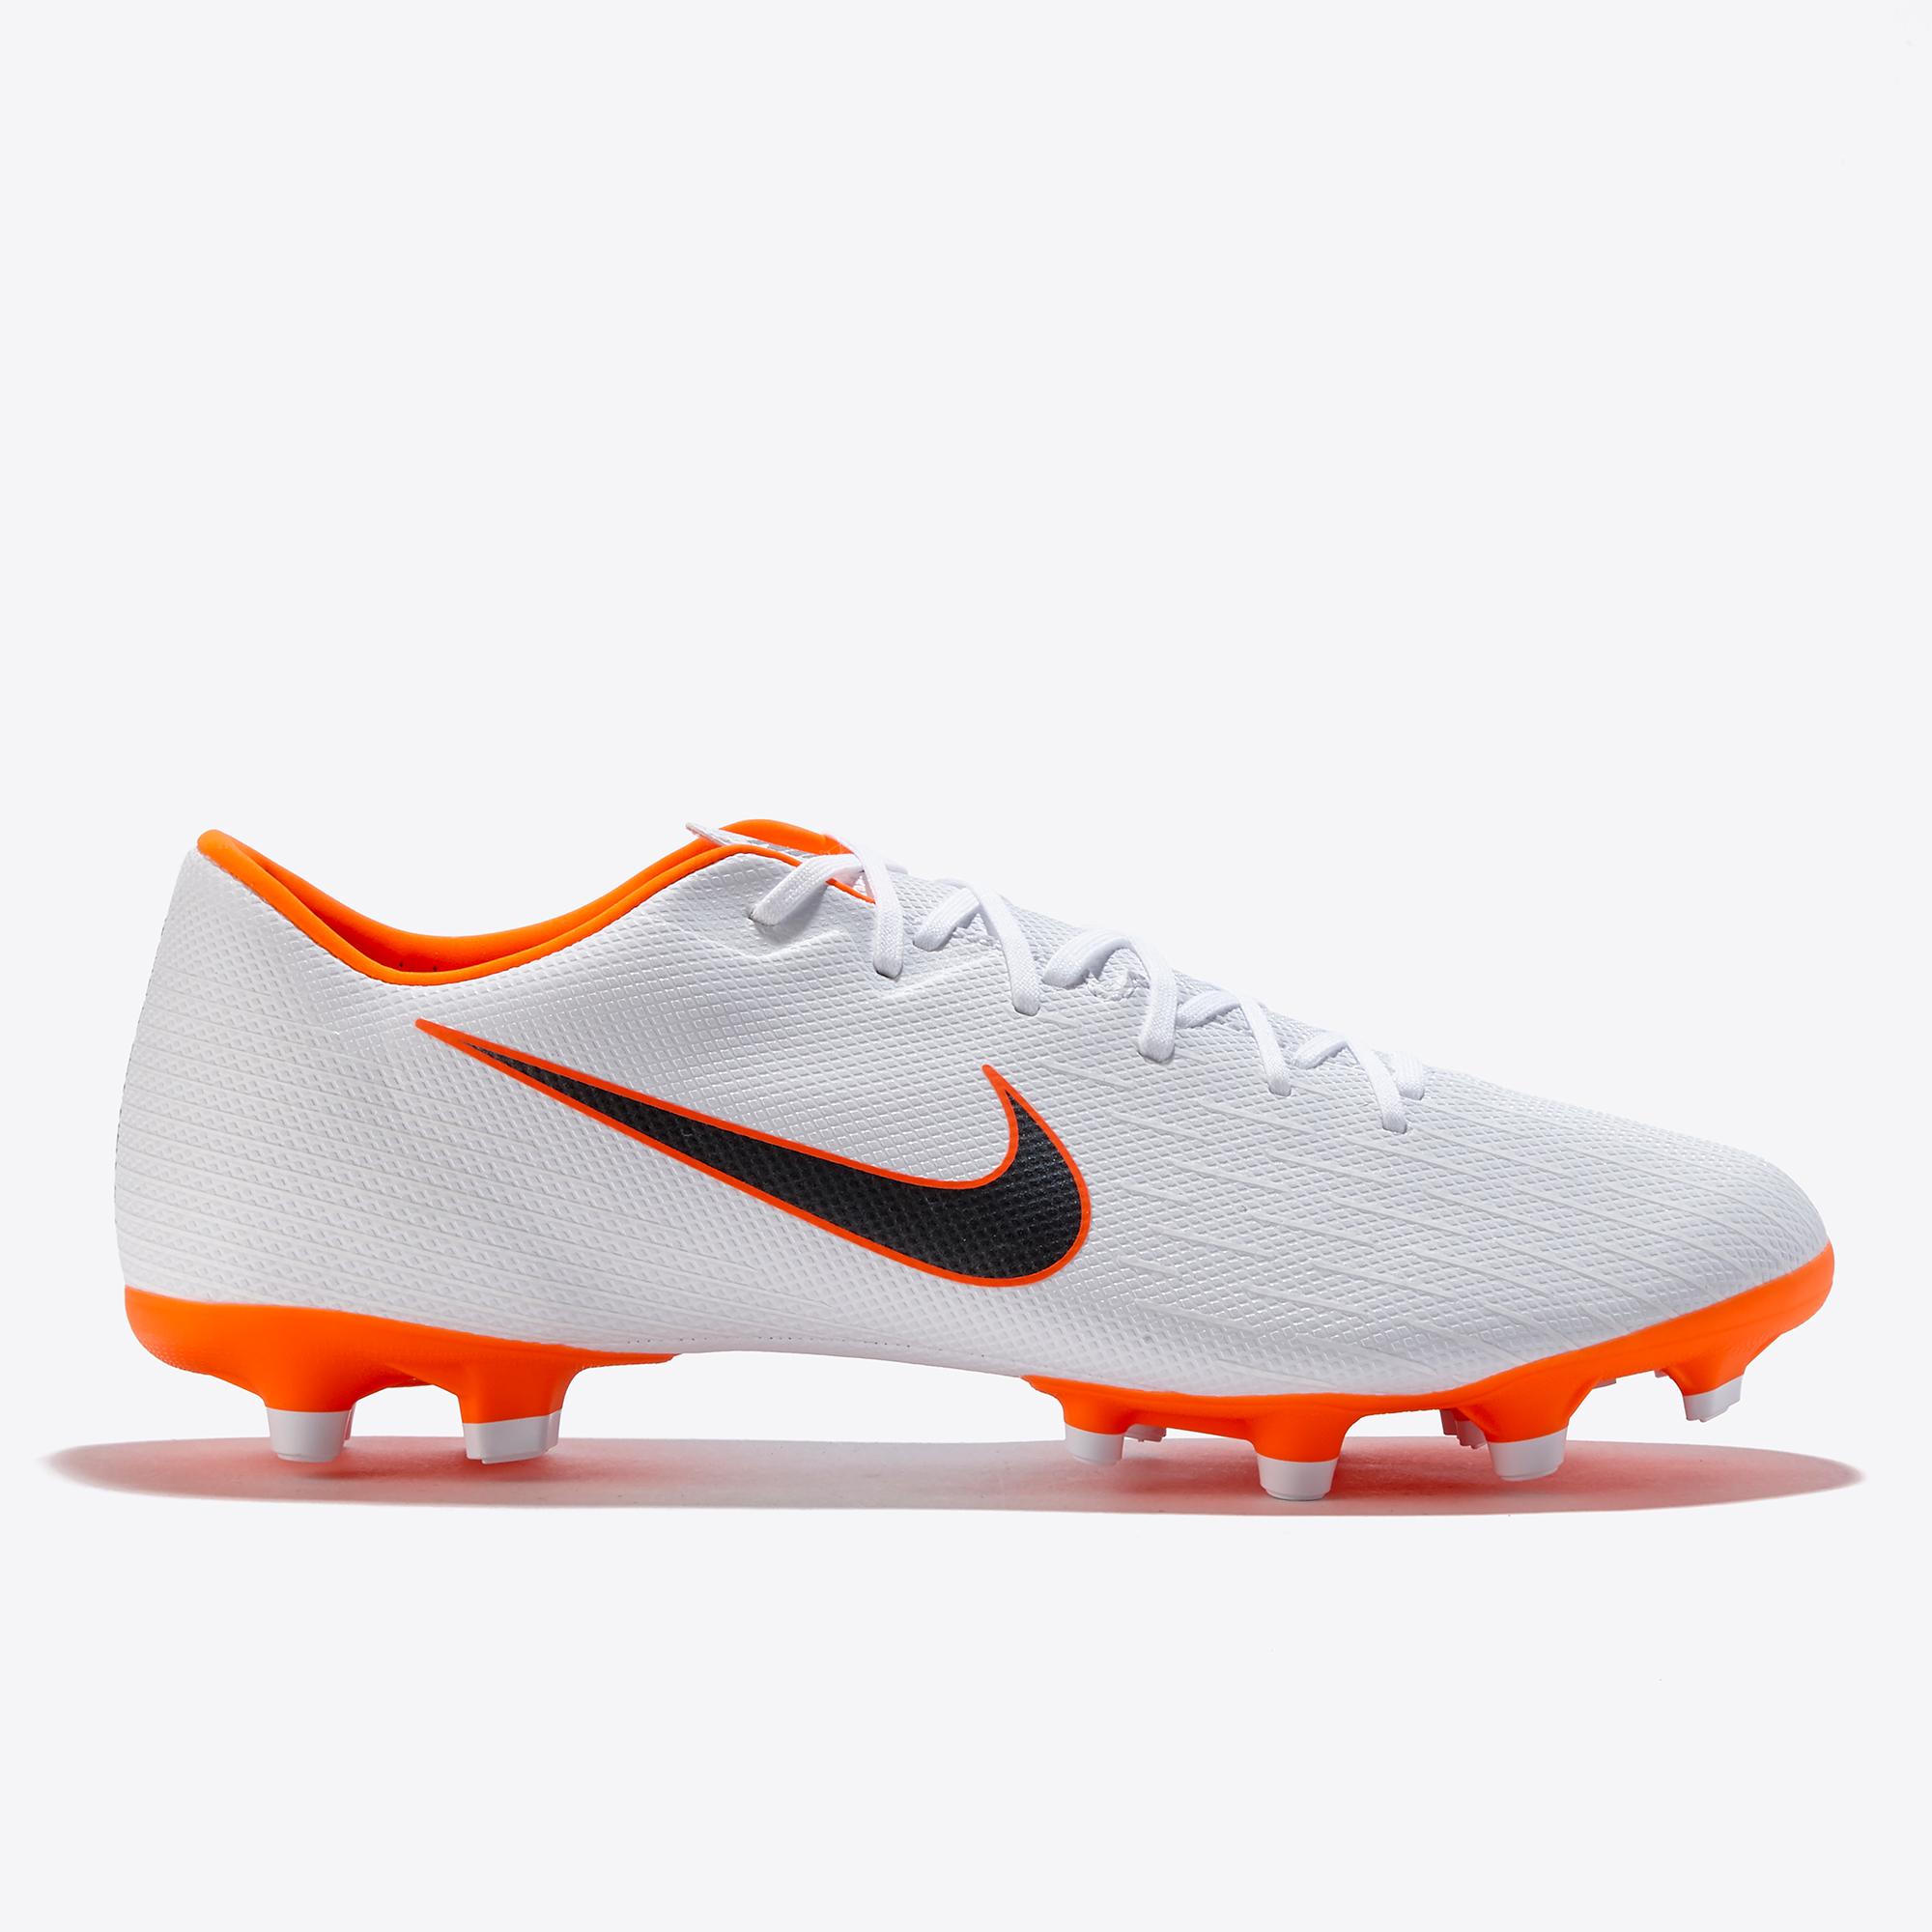 Chaussures de football Nike Mercurial Vapor 12 Academy multi-terrains